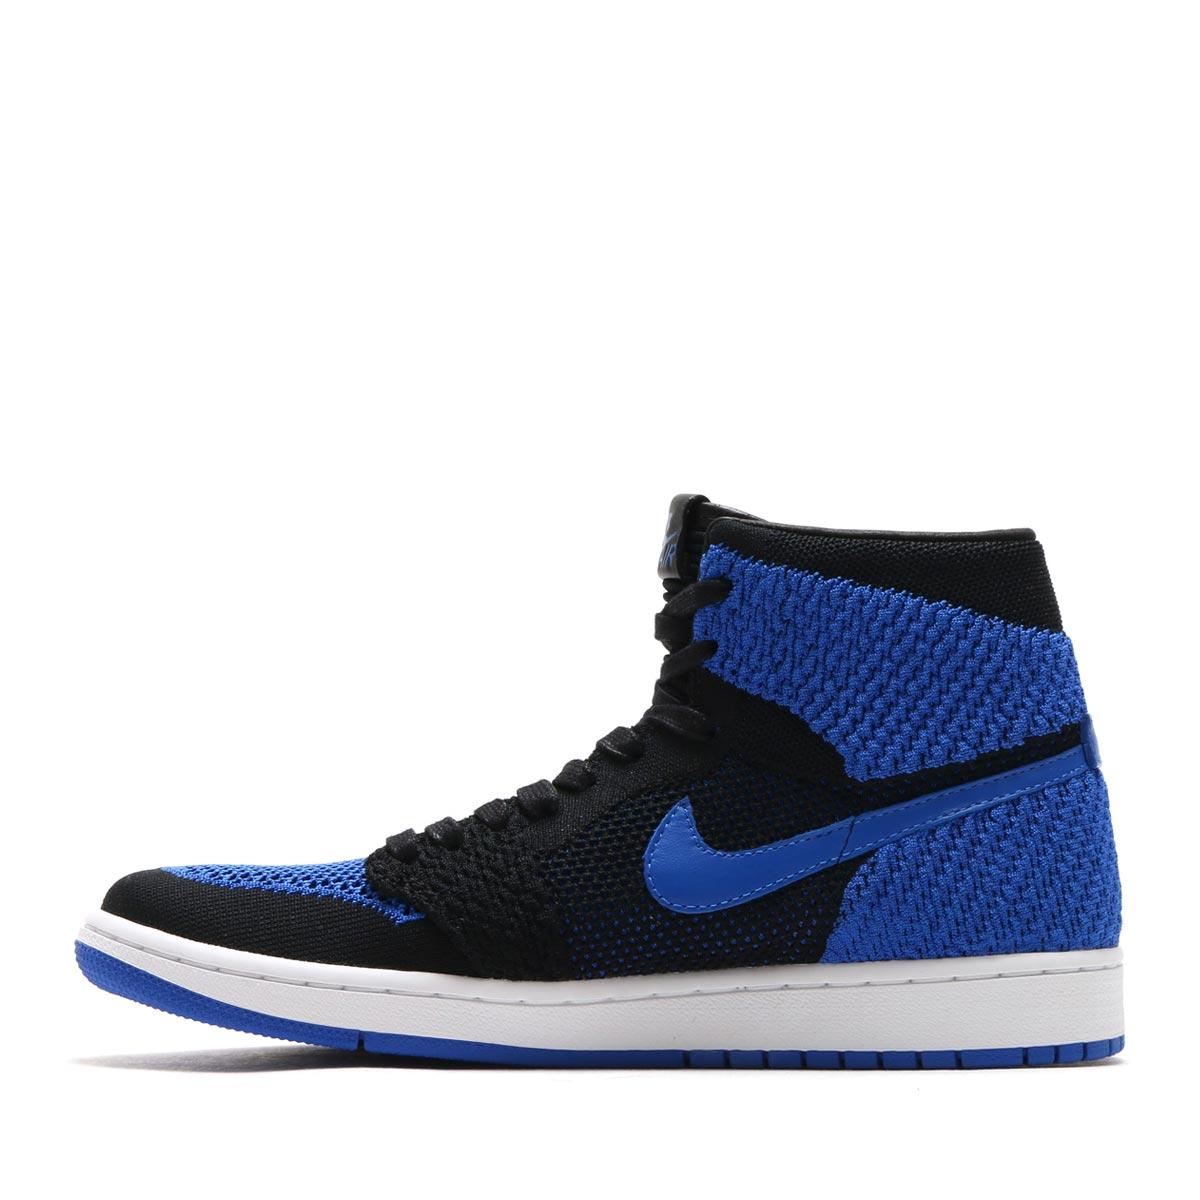 cheap for discount 569ff cab68 NIKE AIR JORDAN 1 RETRO HI FLYKNIT (Nike Air Jordan 1 nostalgic high fried  food knit) BLACK GAME ROYAL-WHITE 17HO-S